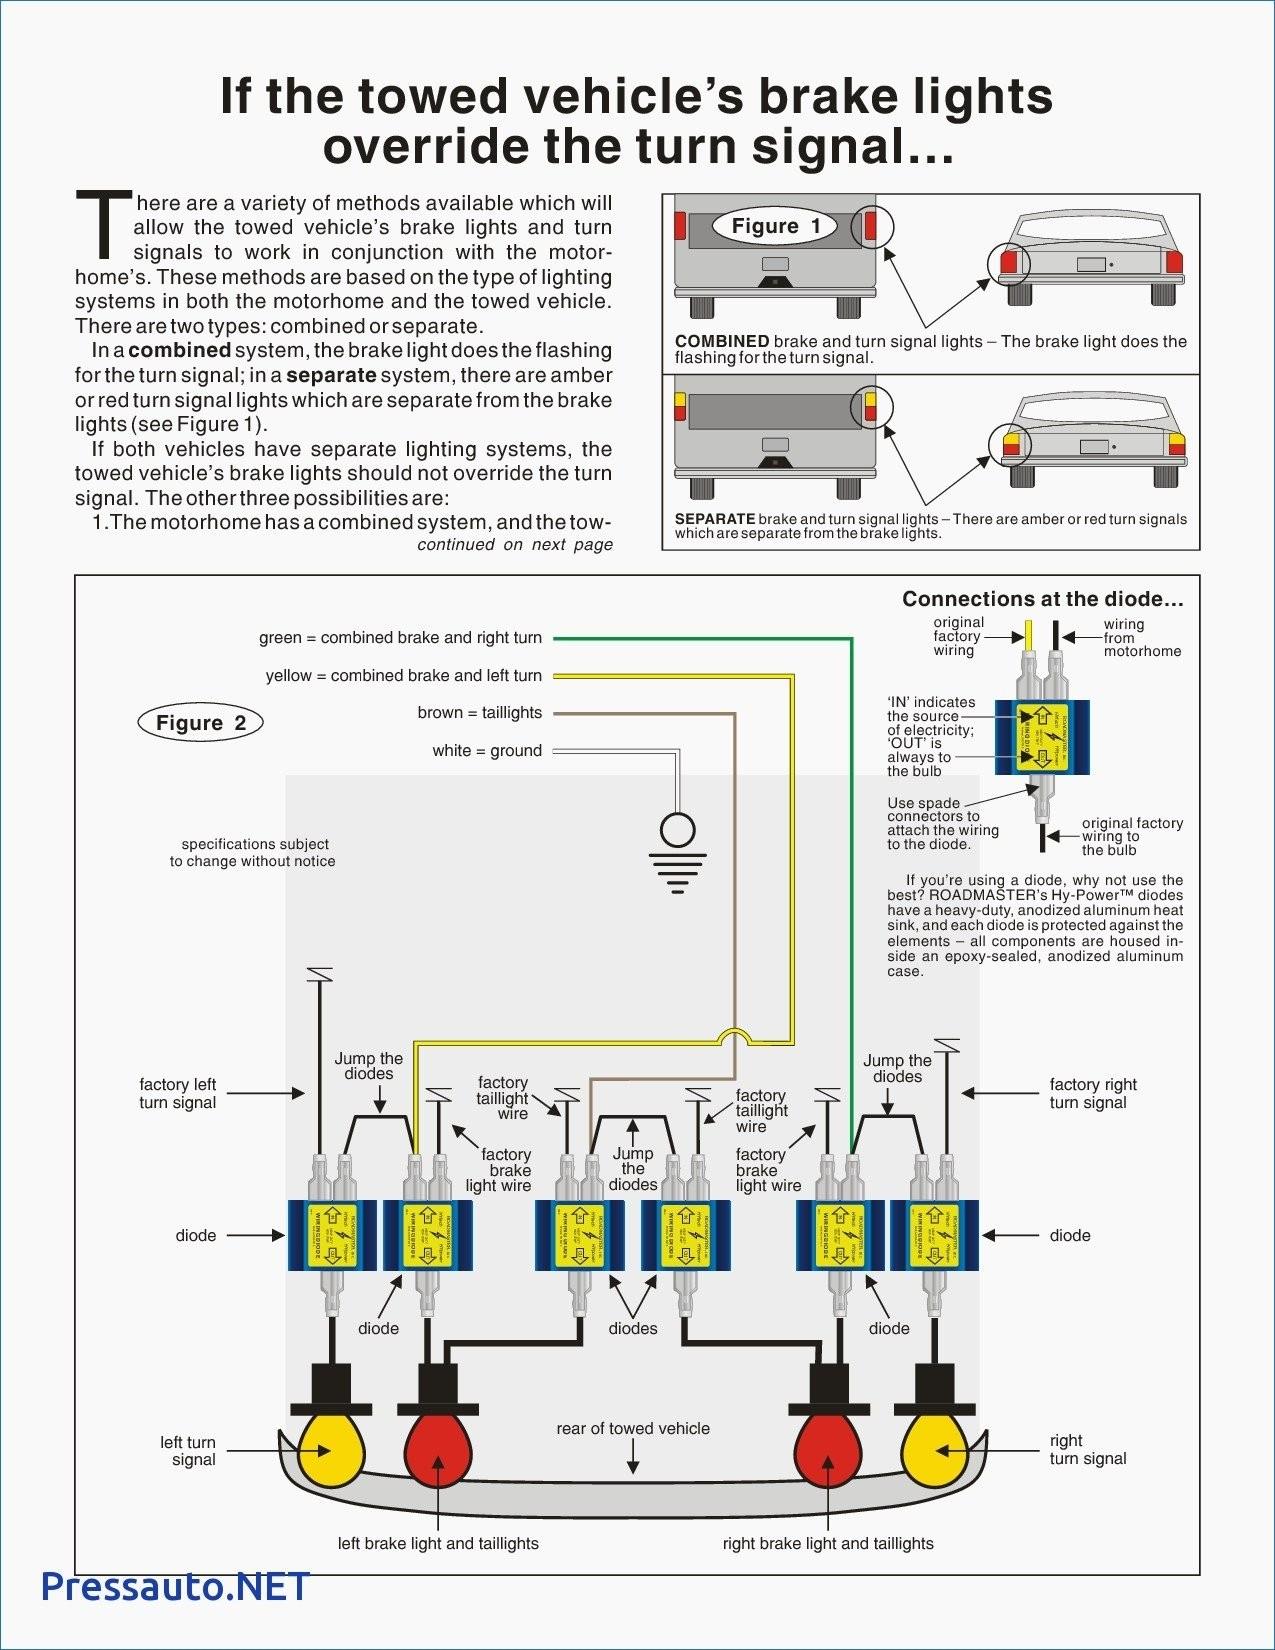 Tail and Brake Light Grote Led Wiring Diagram Grote Tail Light Wiring Diagram Wiring Diagram Schematic Of Tail and Brake Light Grote Led Wiring Diagram